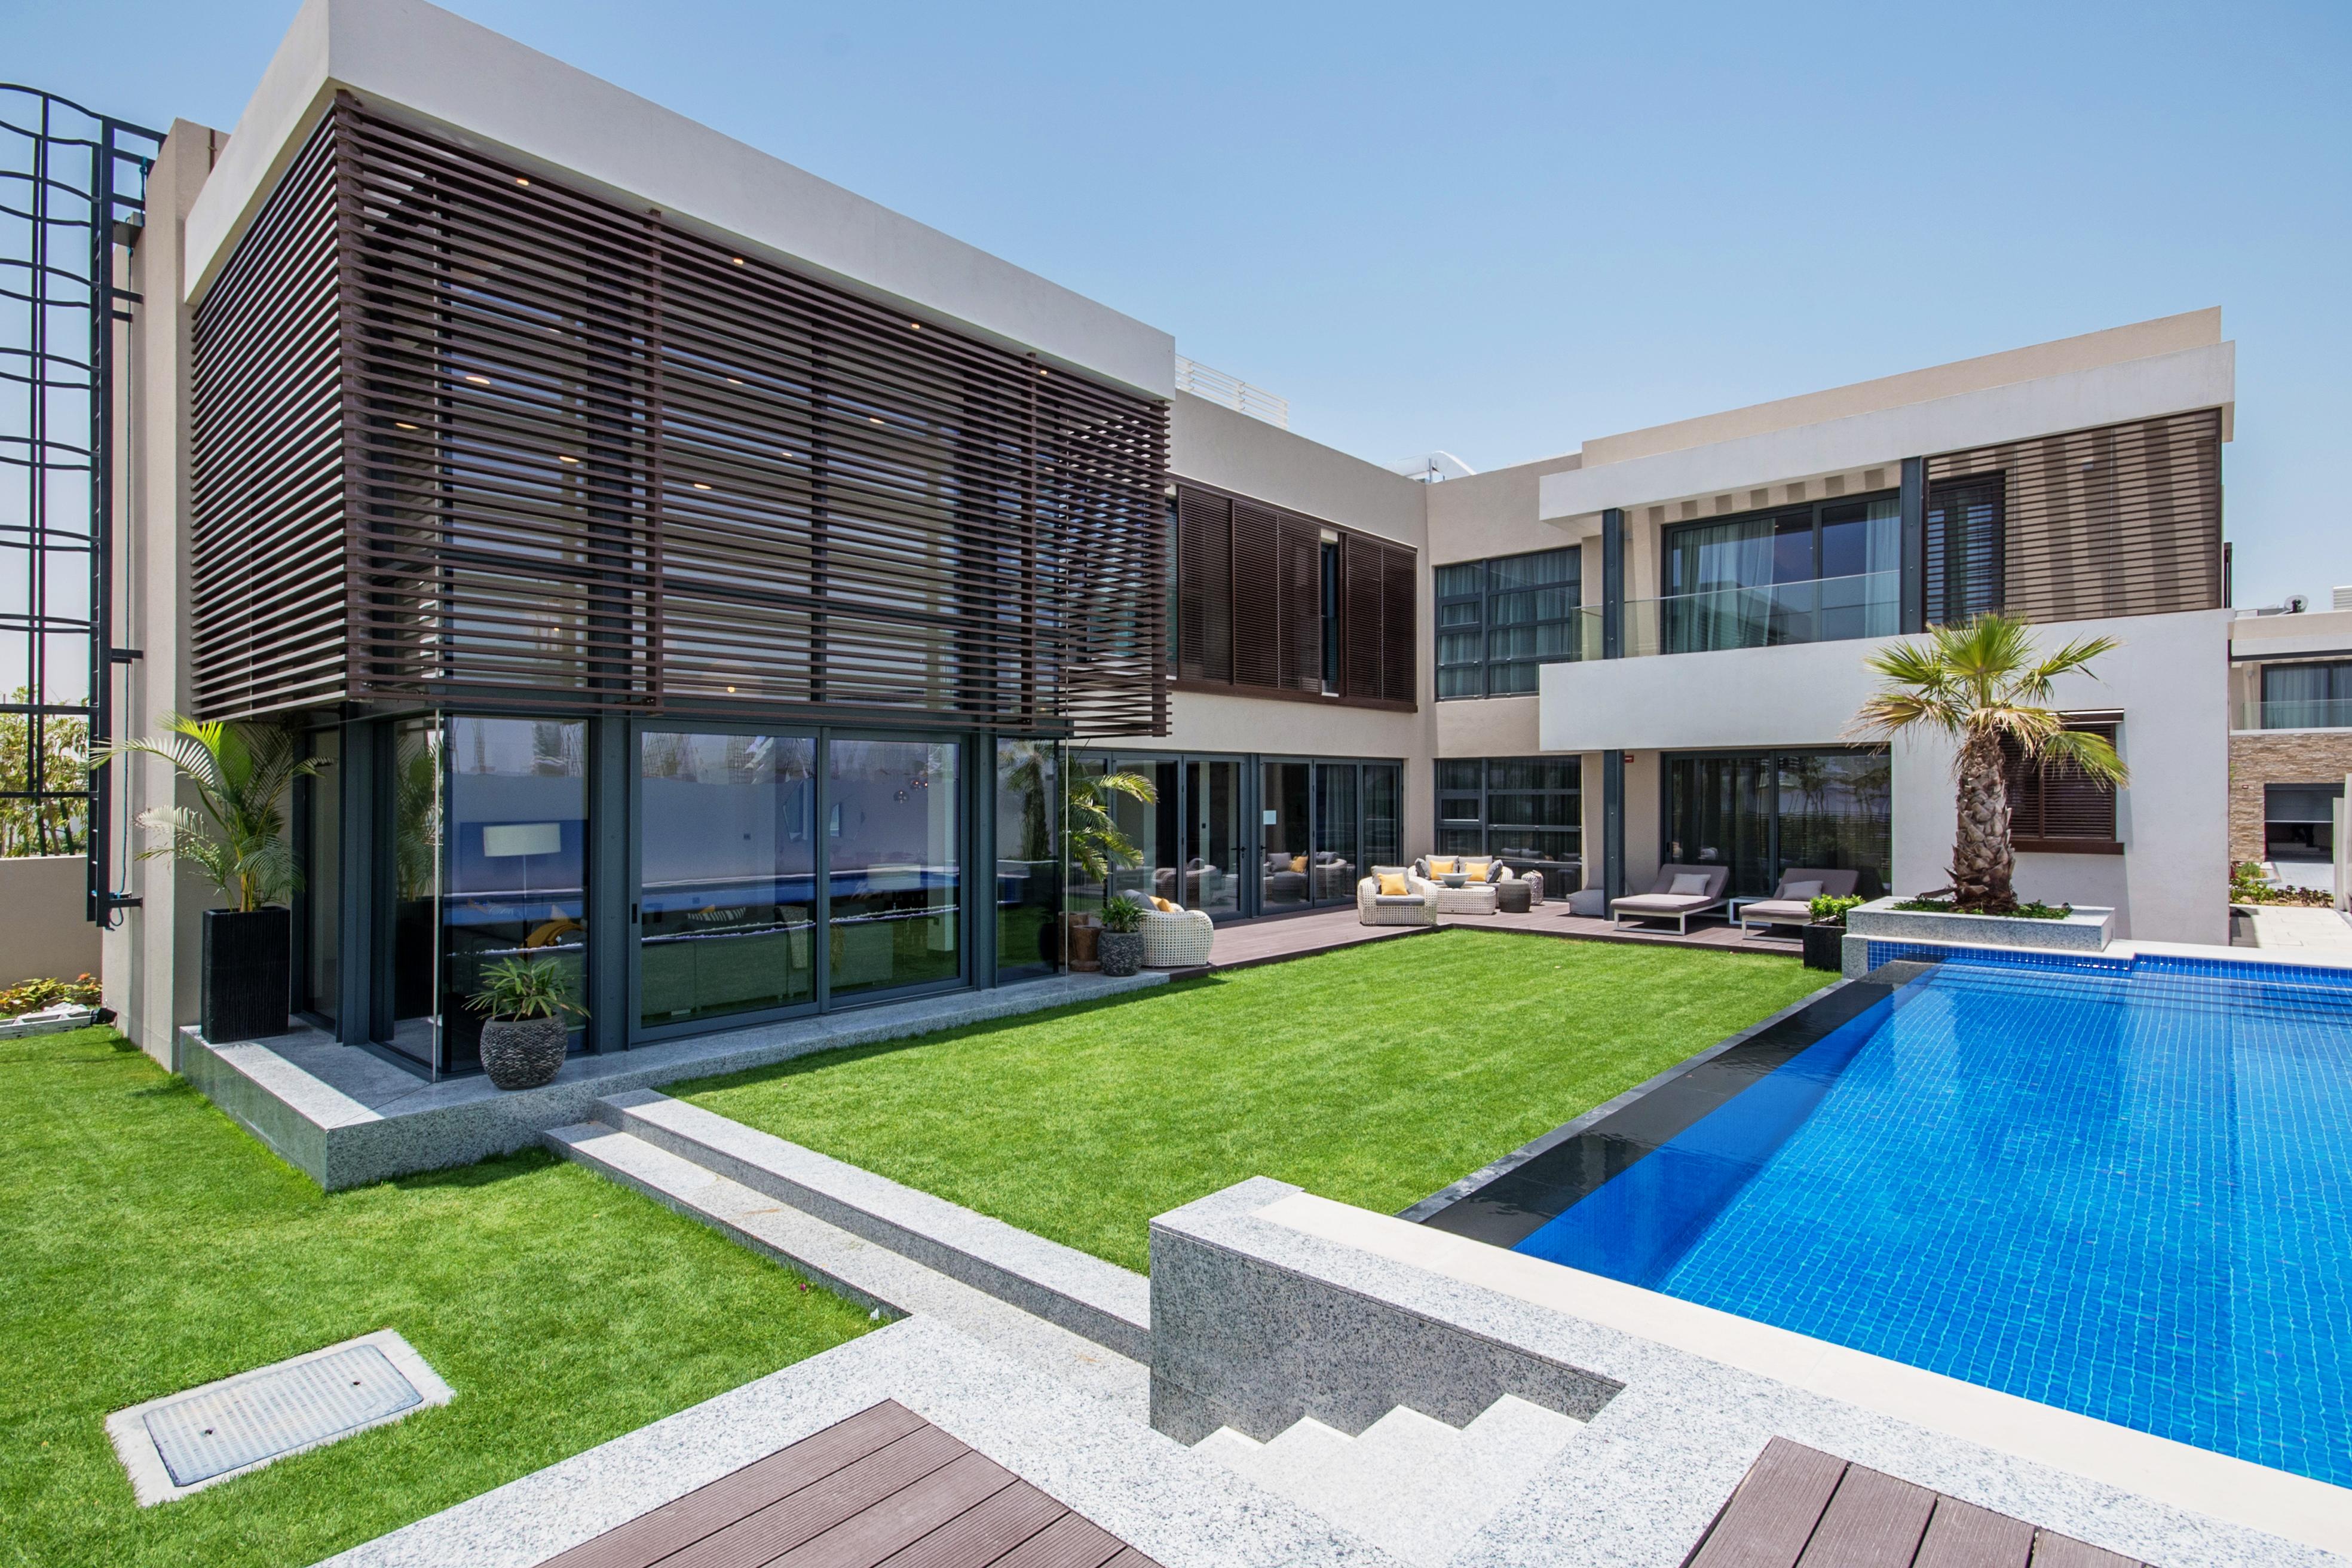 4 bedroom villa exterior (12)